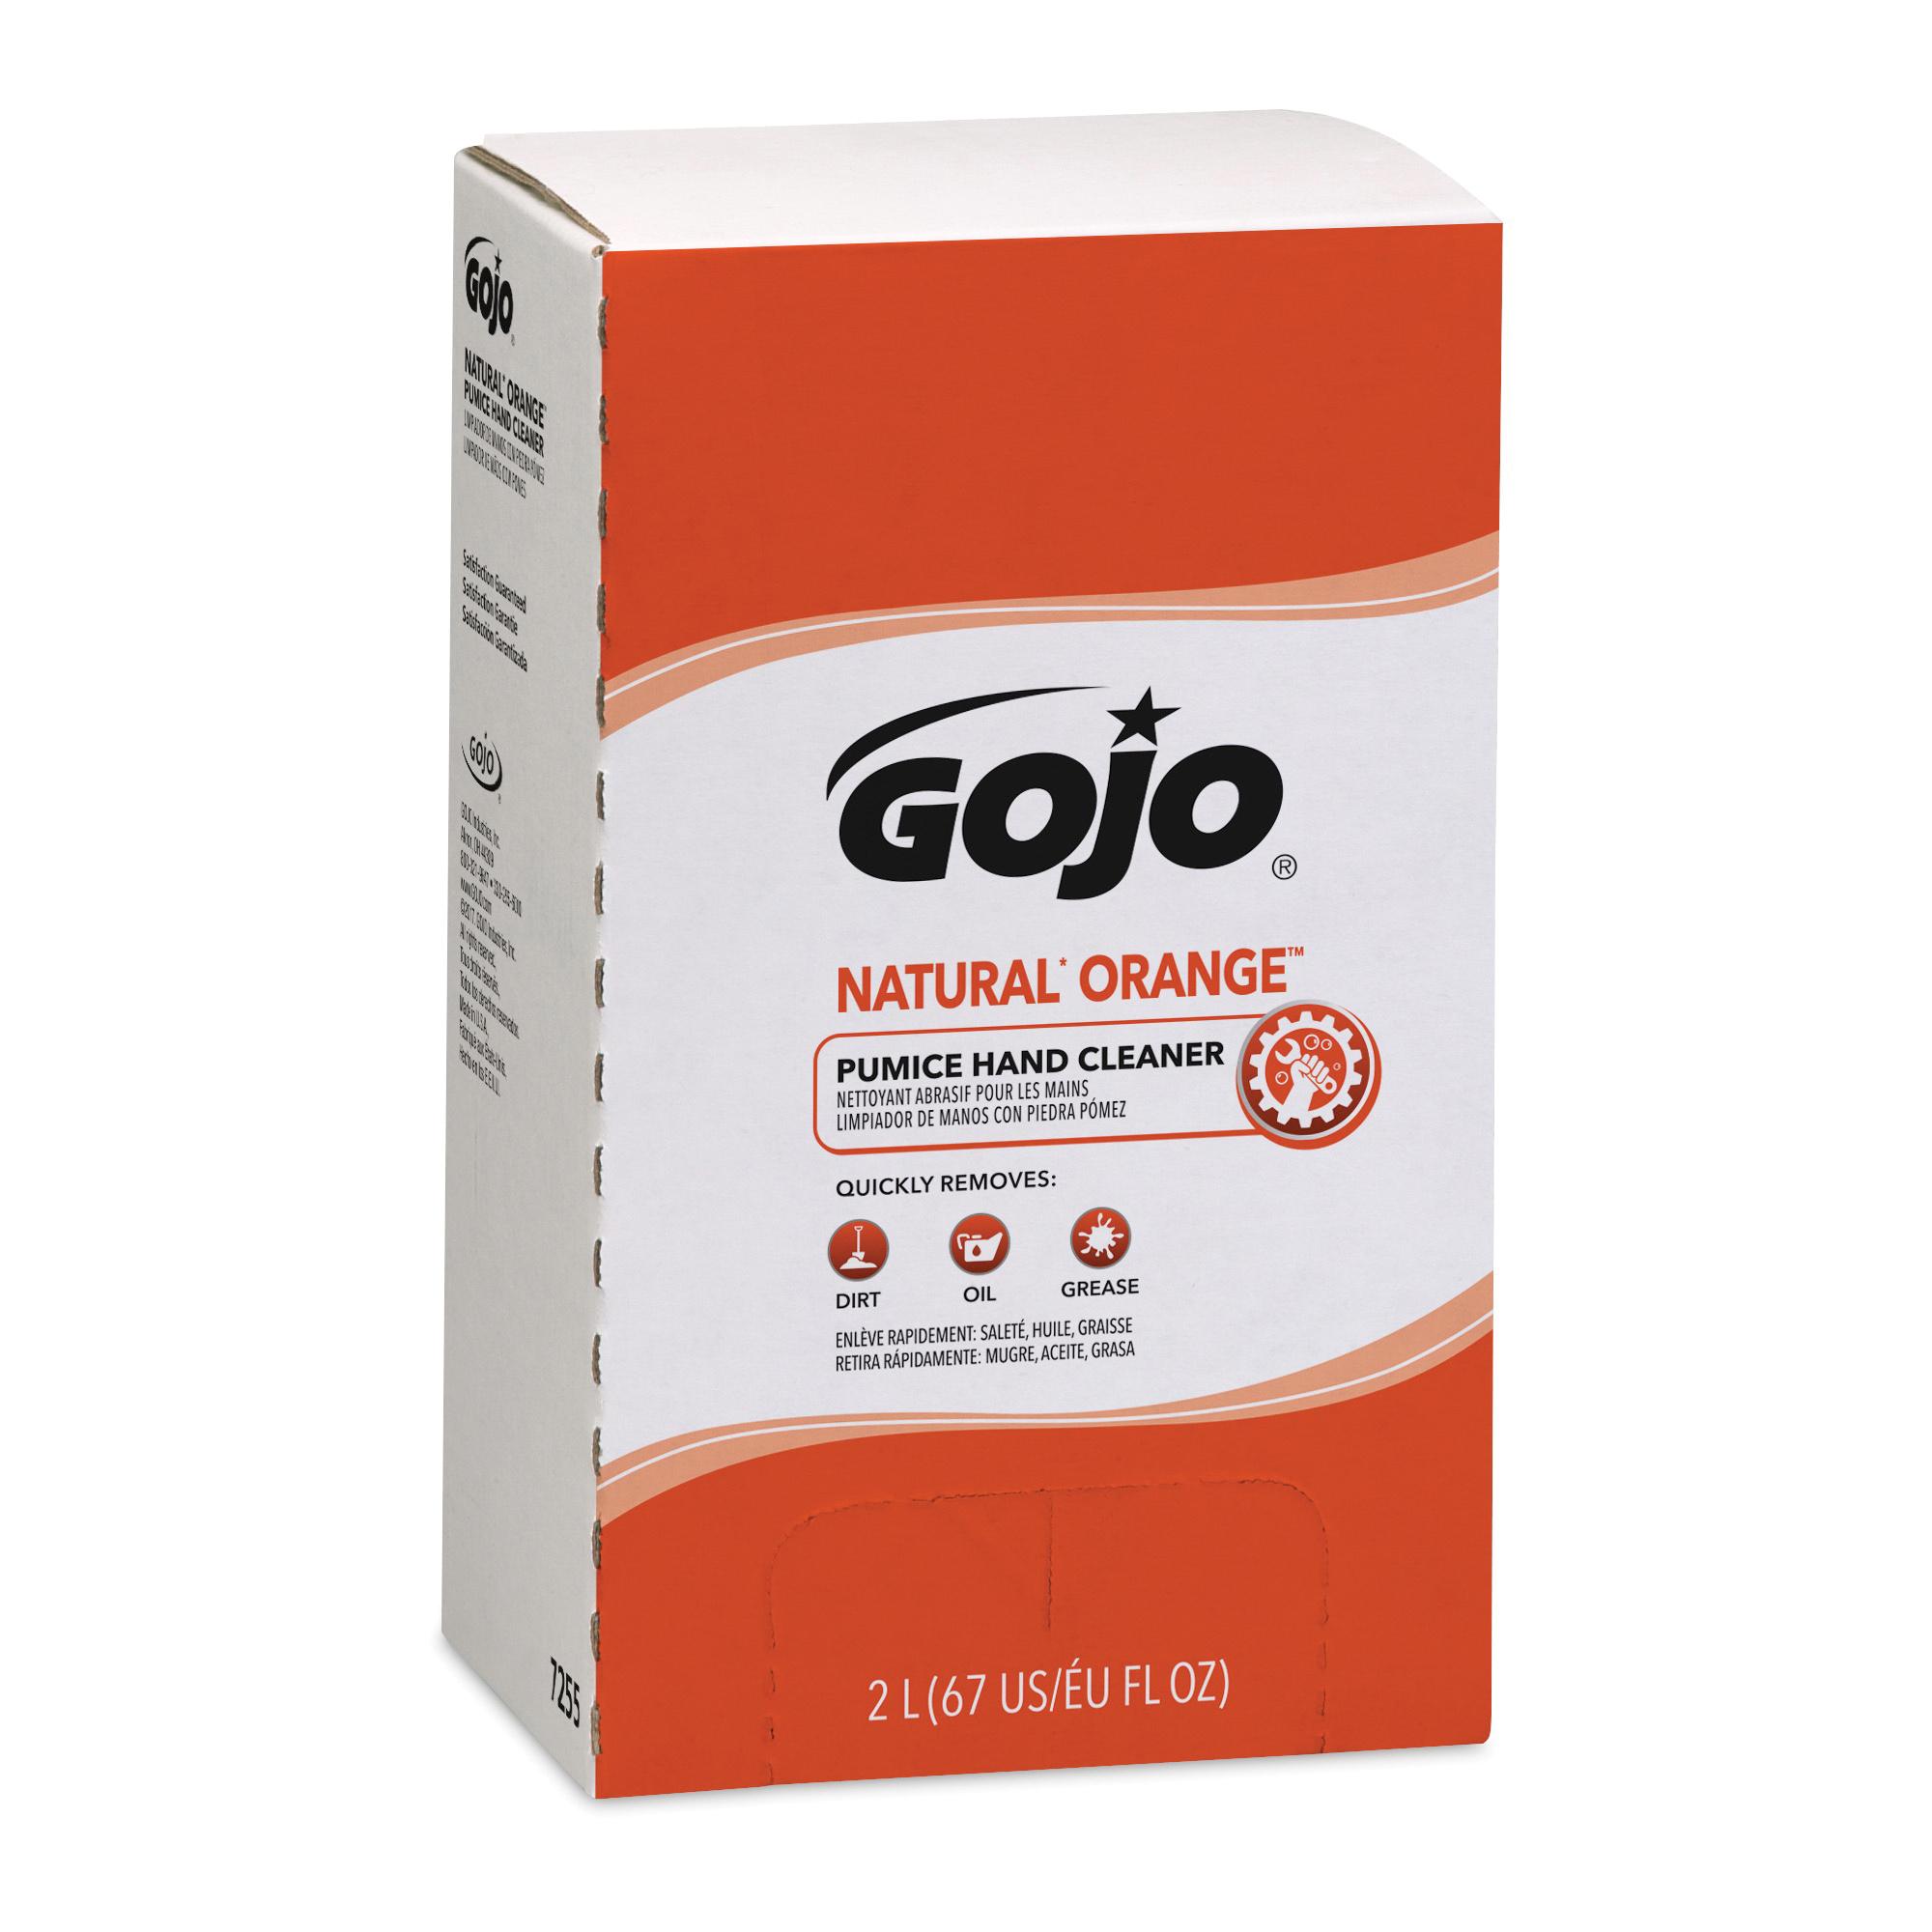 GOJO® 7255-04 NATURAL ORANGE™ PRO™ TDX™ Pumice Hand Cleaner With Pumice Scrubbers, 2000 mL, Dispenser Refill, Lotion, Citrus, Orange